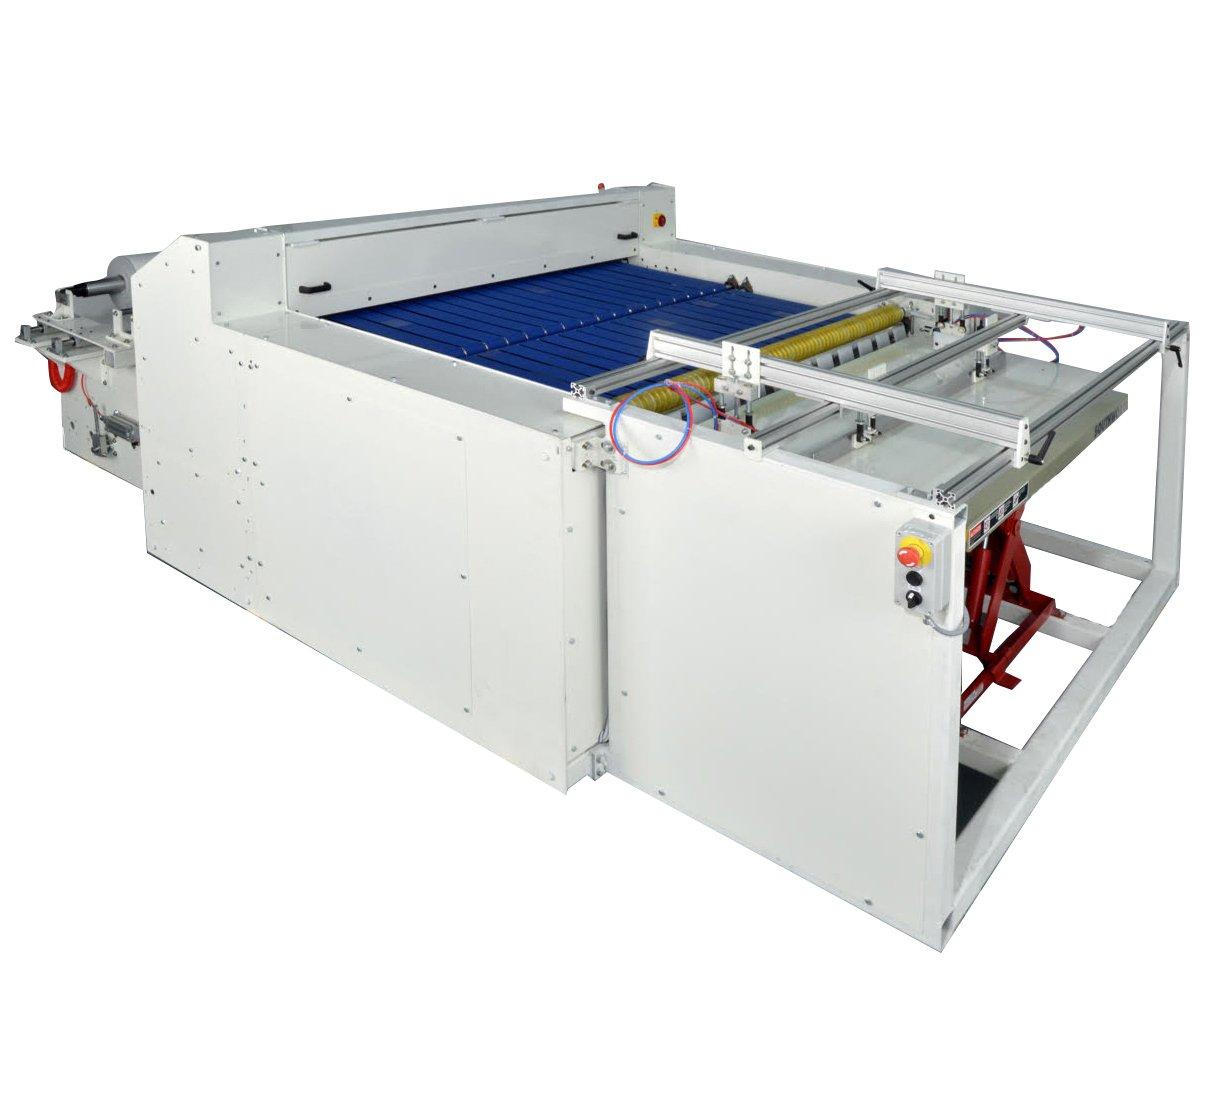 RCS with Conveyor Stacker